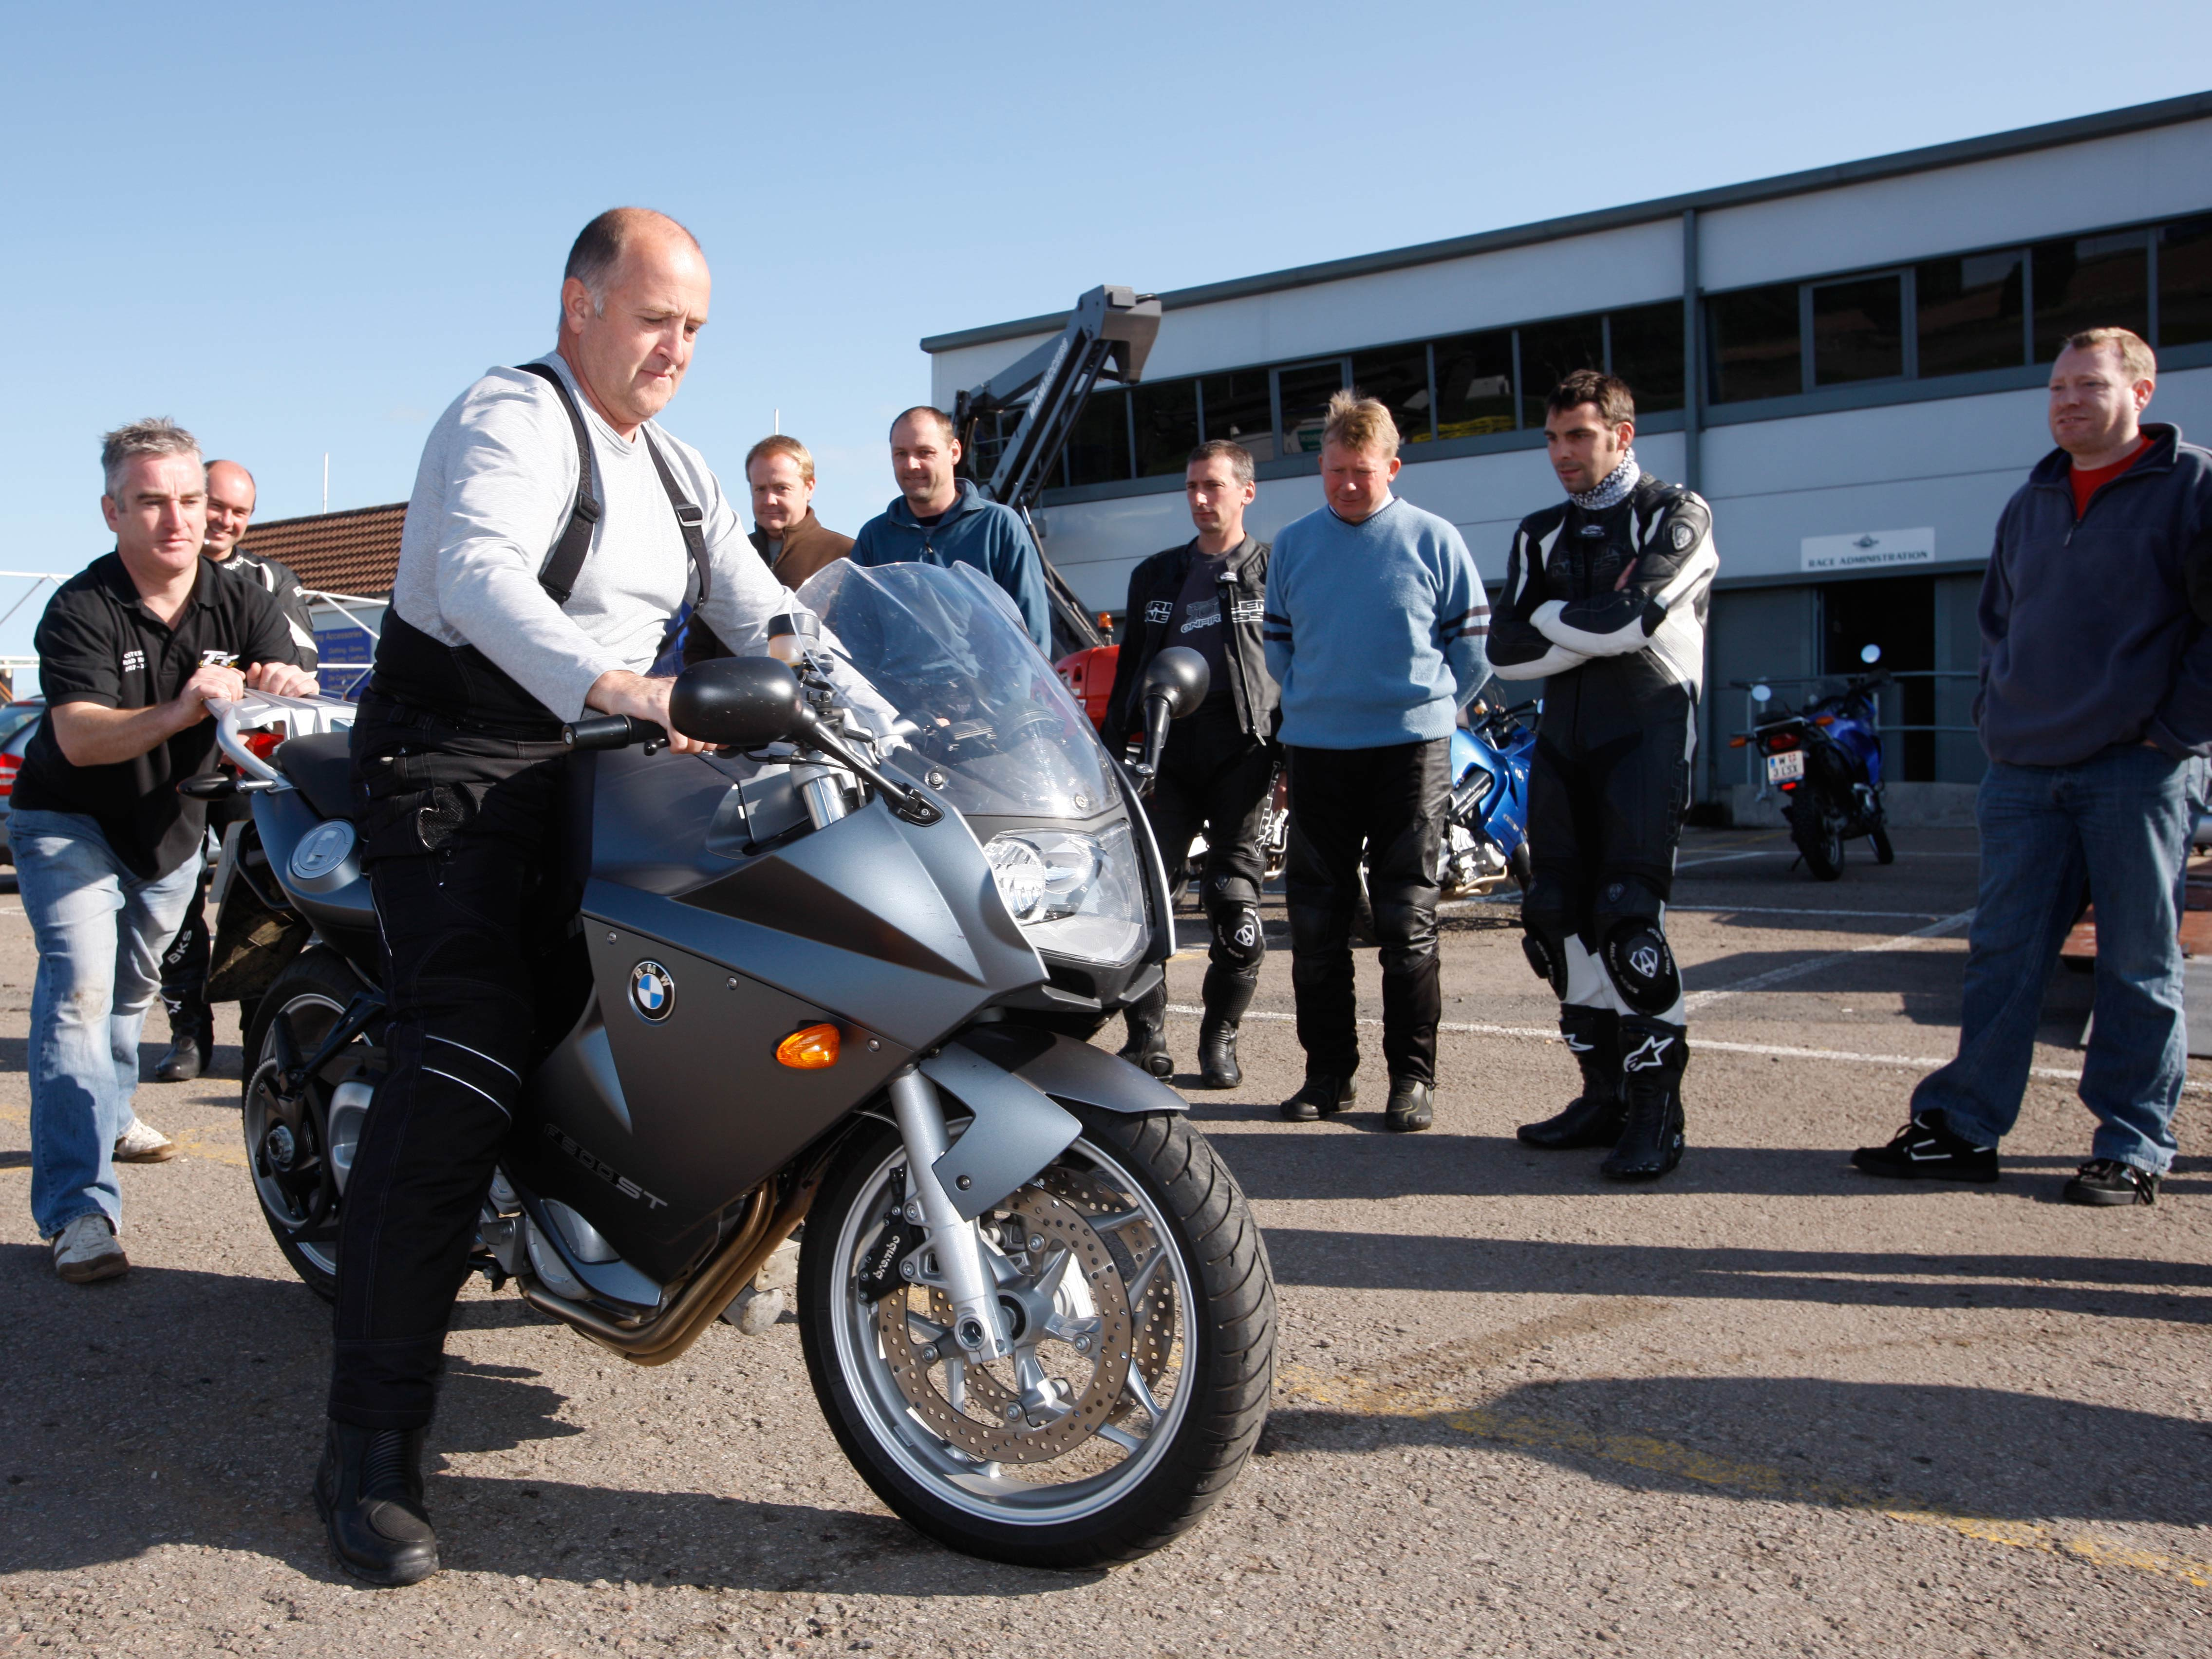 Direct Access Motorcycle Birmingham